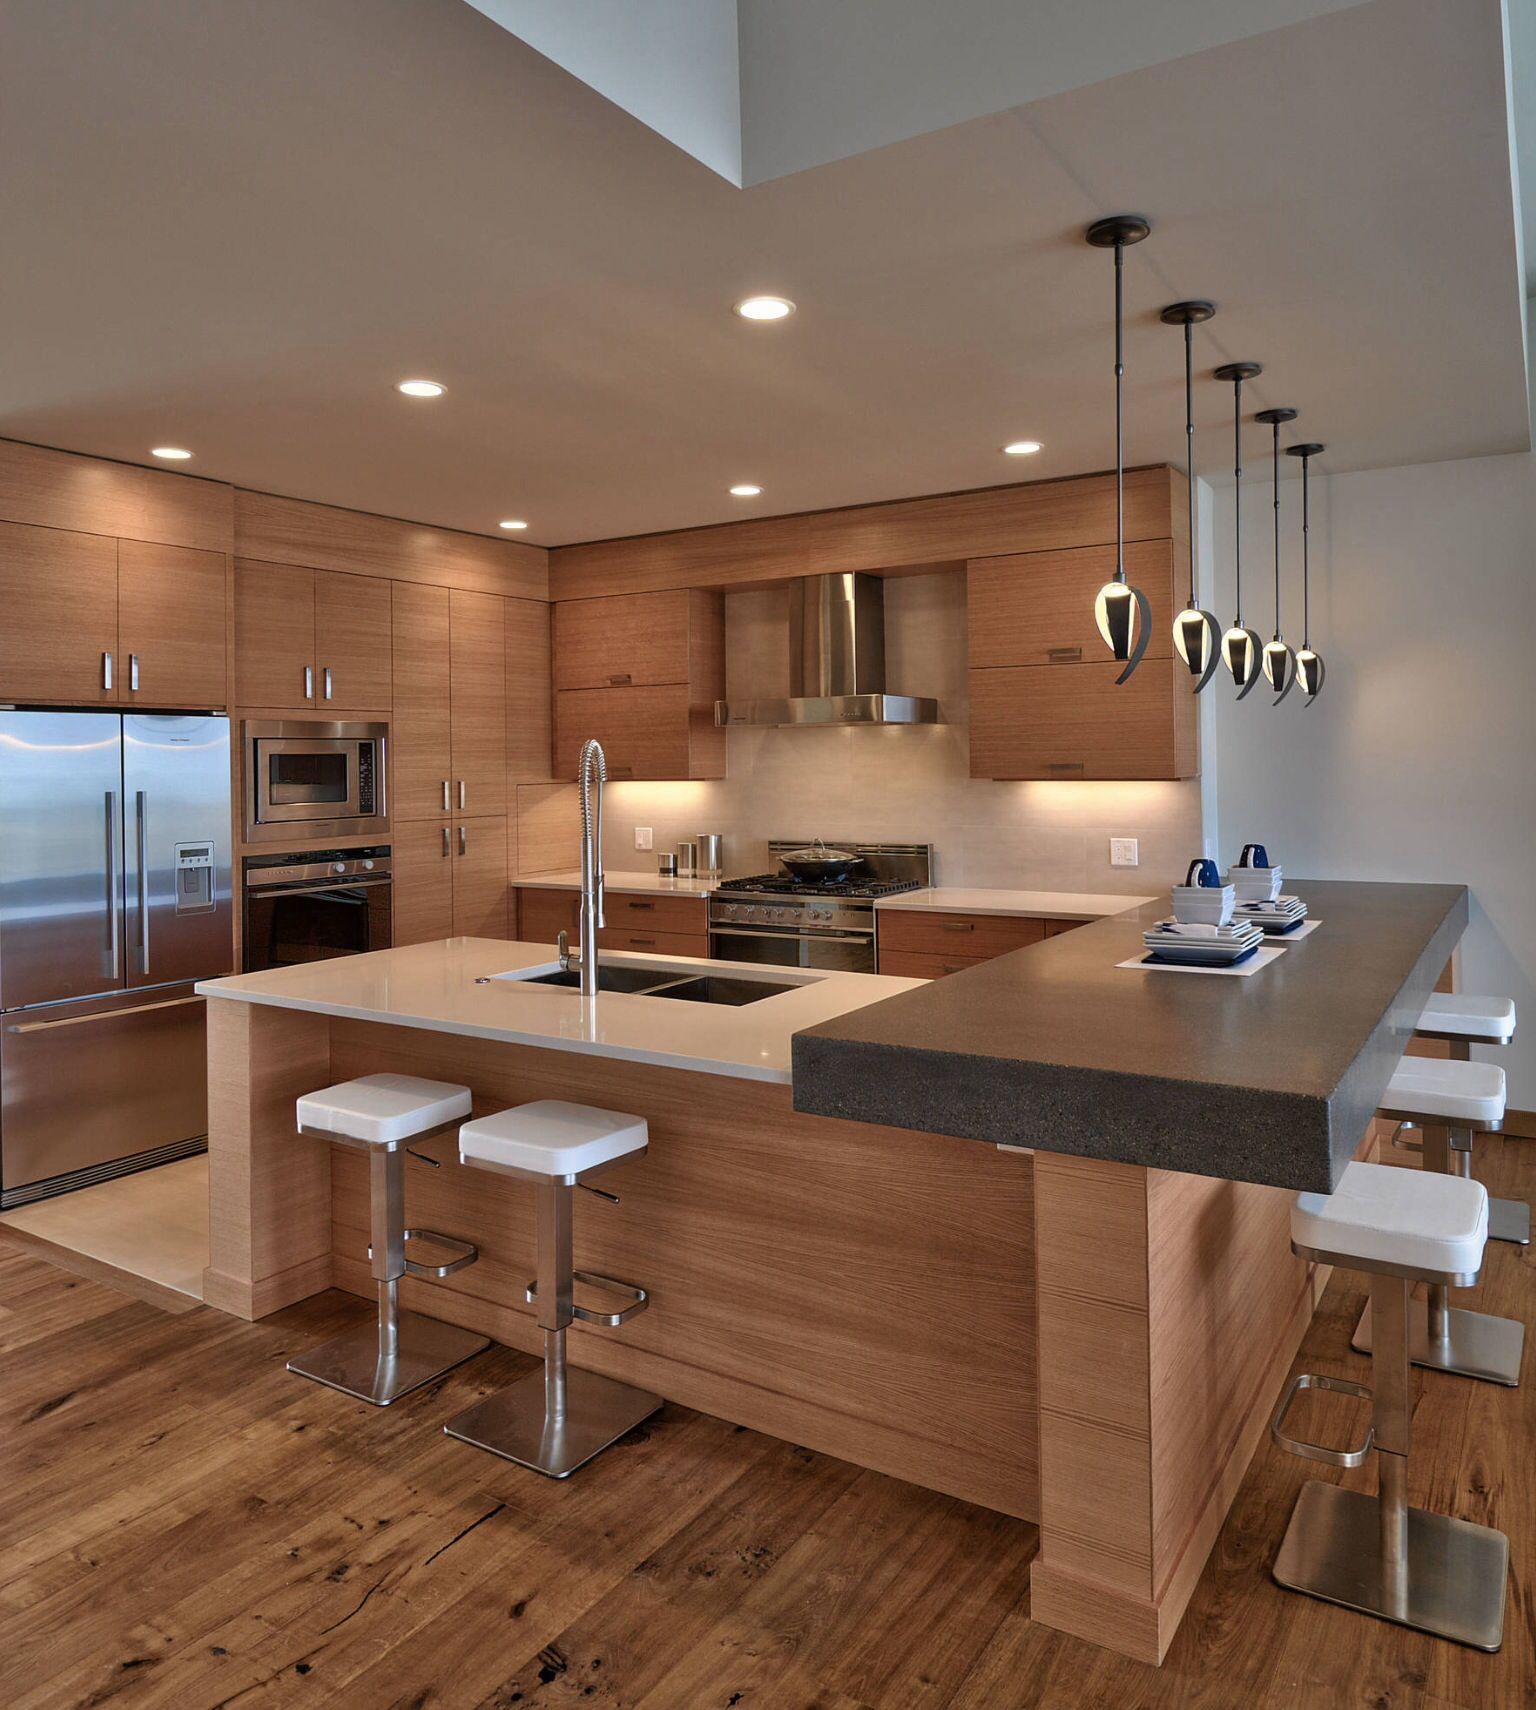 m s de 25 ideas incre bles sobre mueble cocina americana